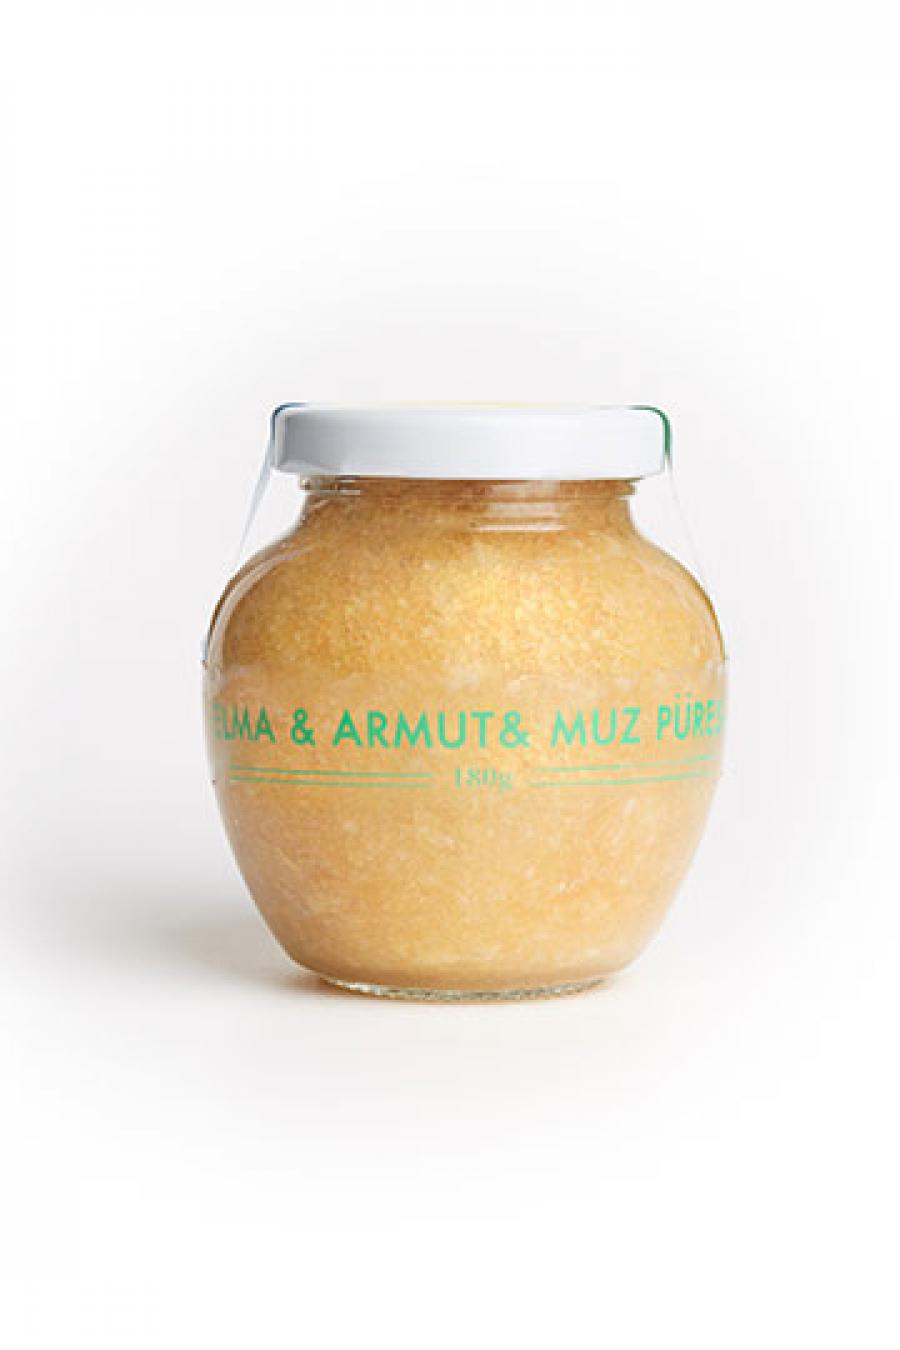 Elma & Armut & Muz Püresi (180 gr)